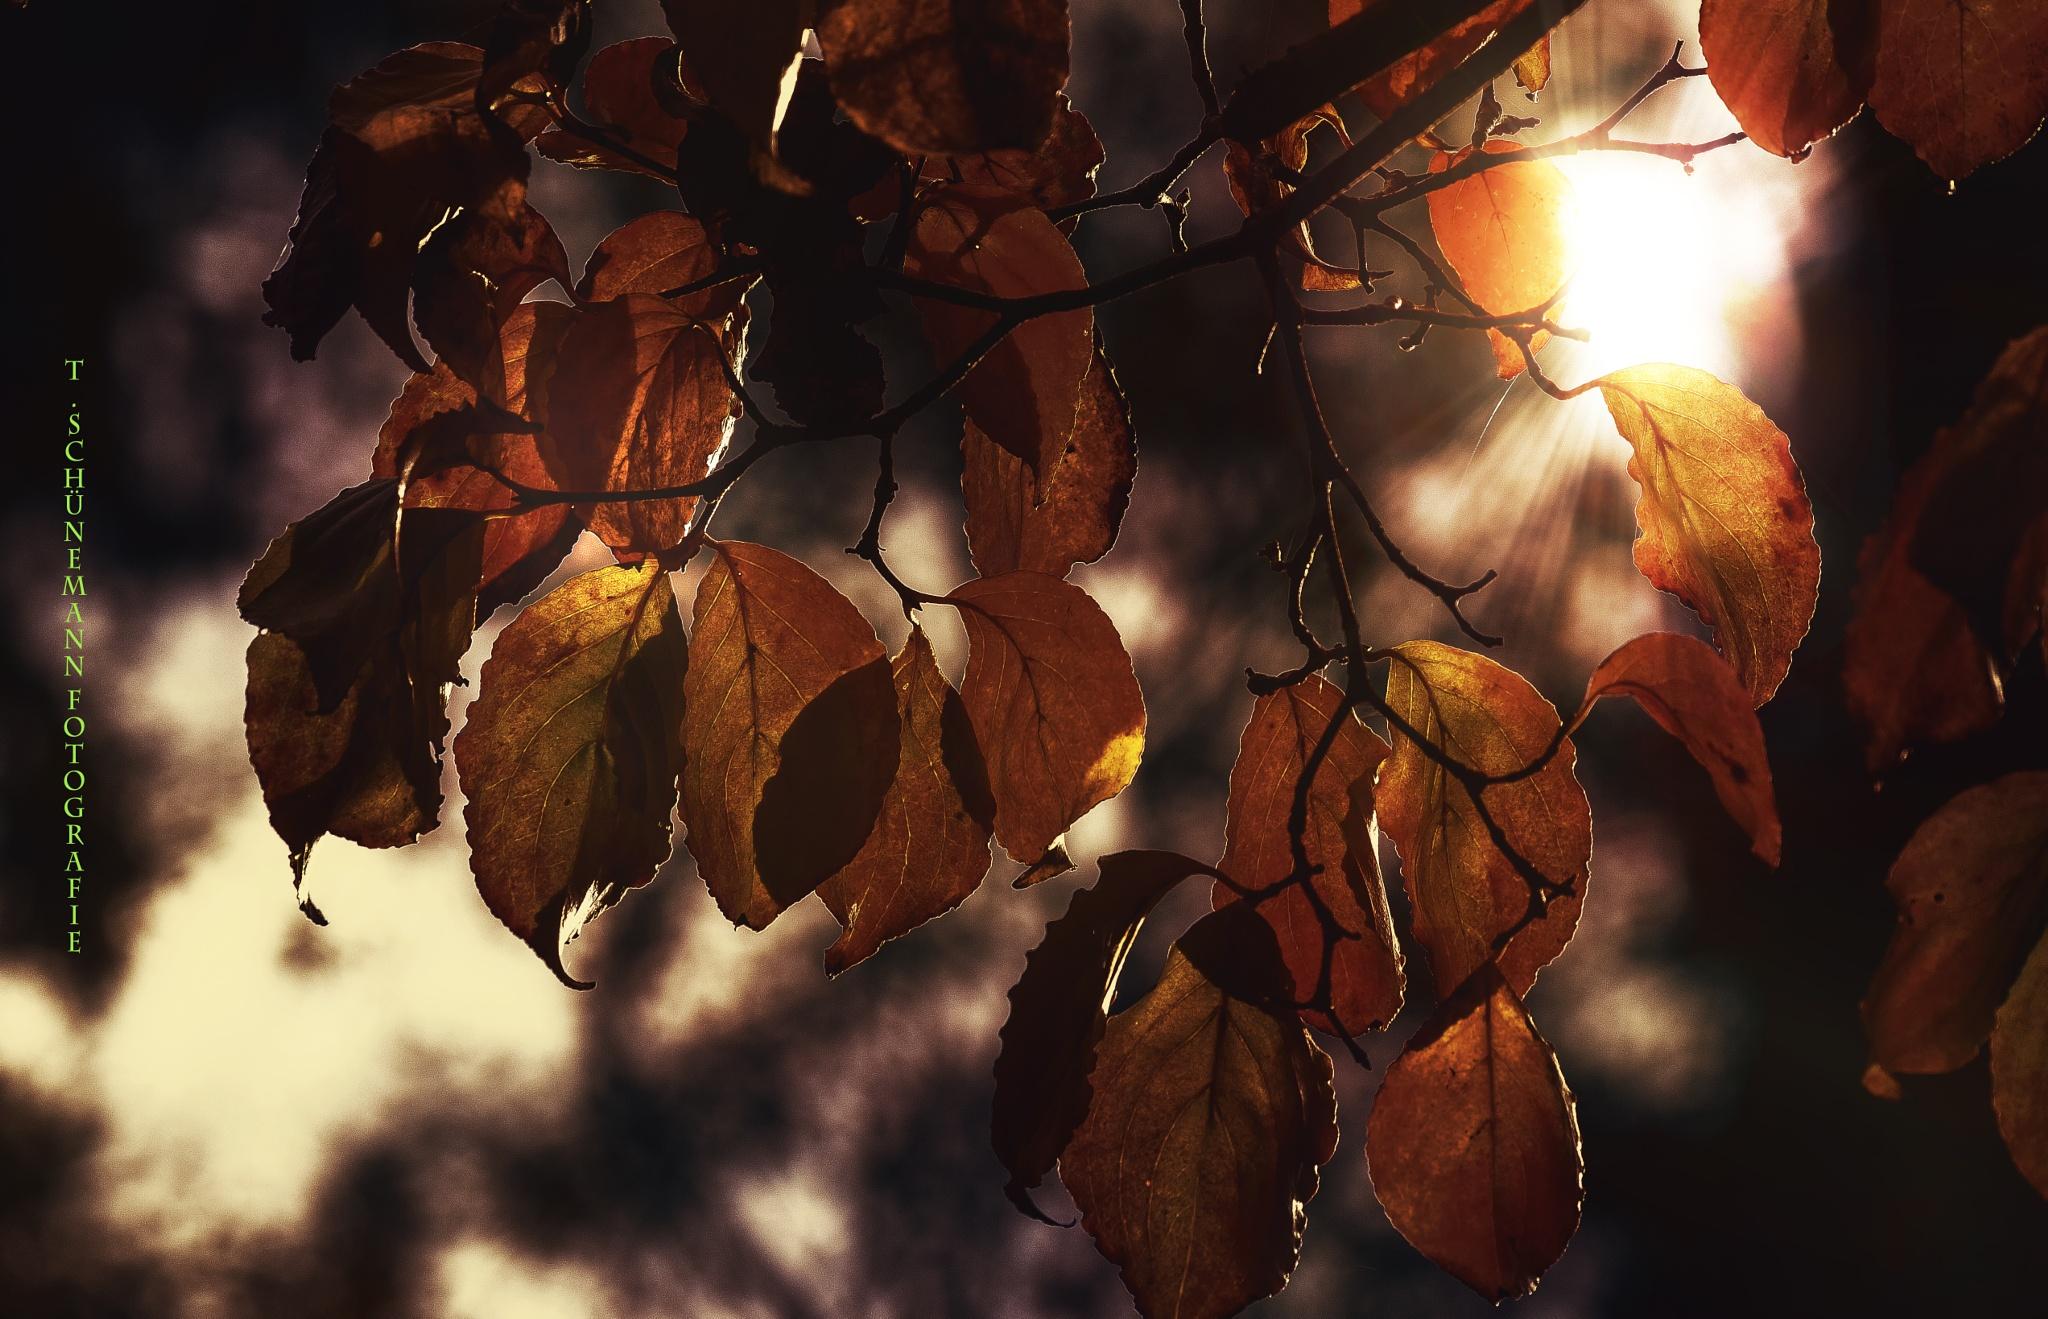 Herbst Anfang by Thorsten Schünemann